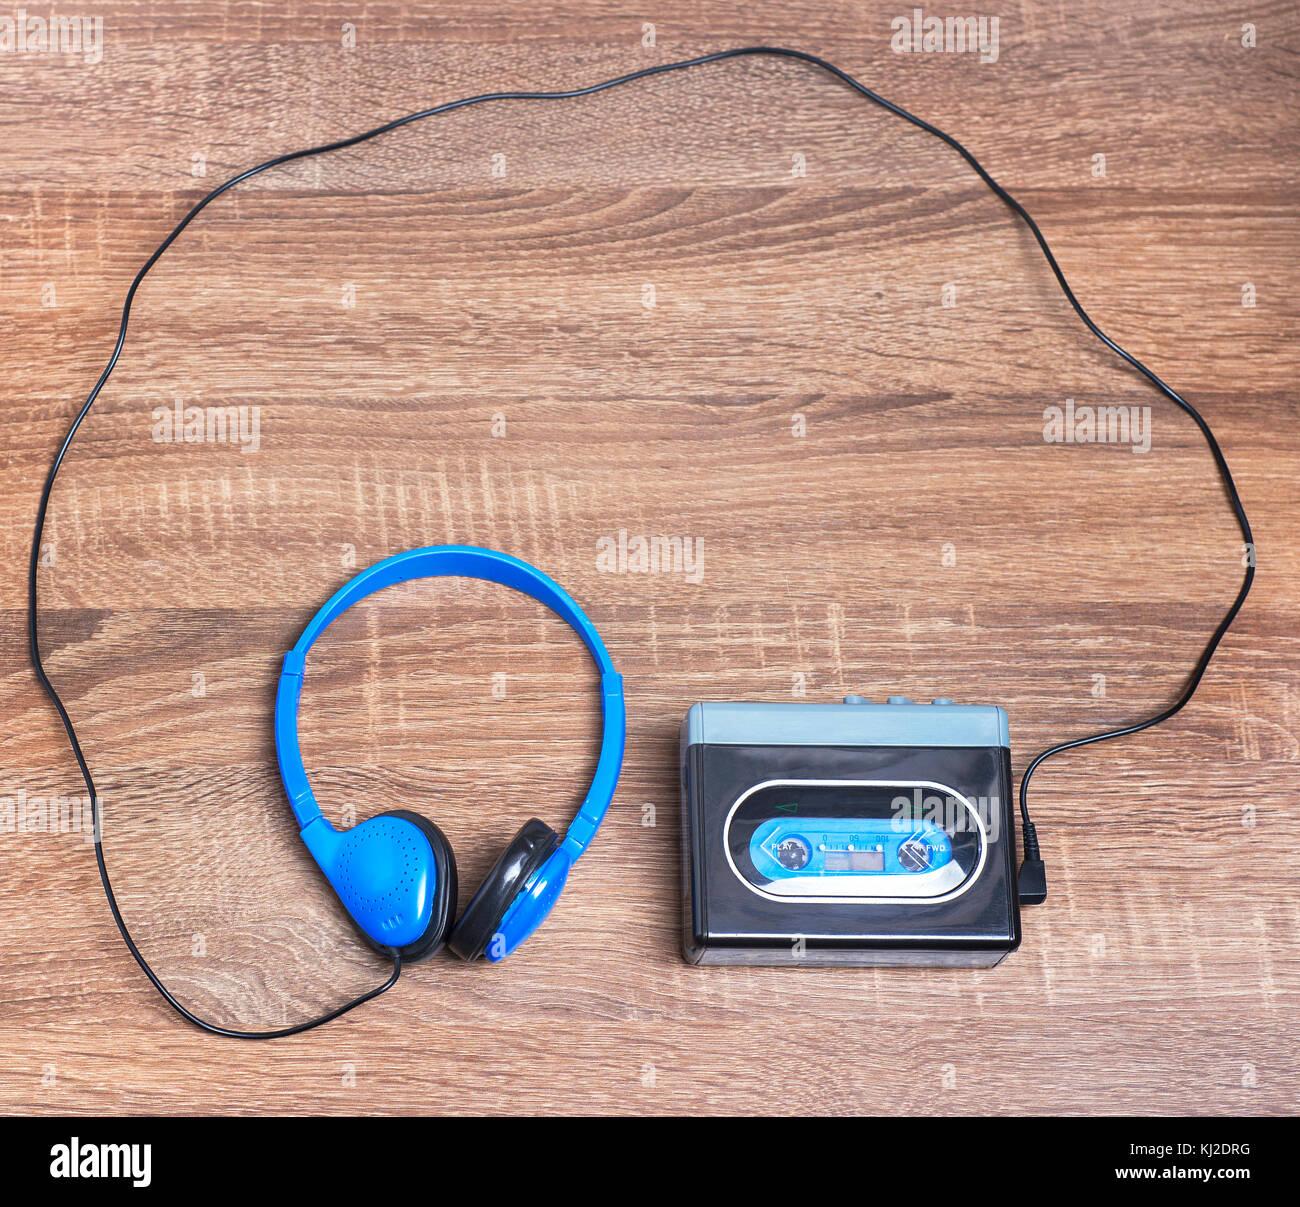 Vintage walkman and headphones - Stock Image